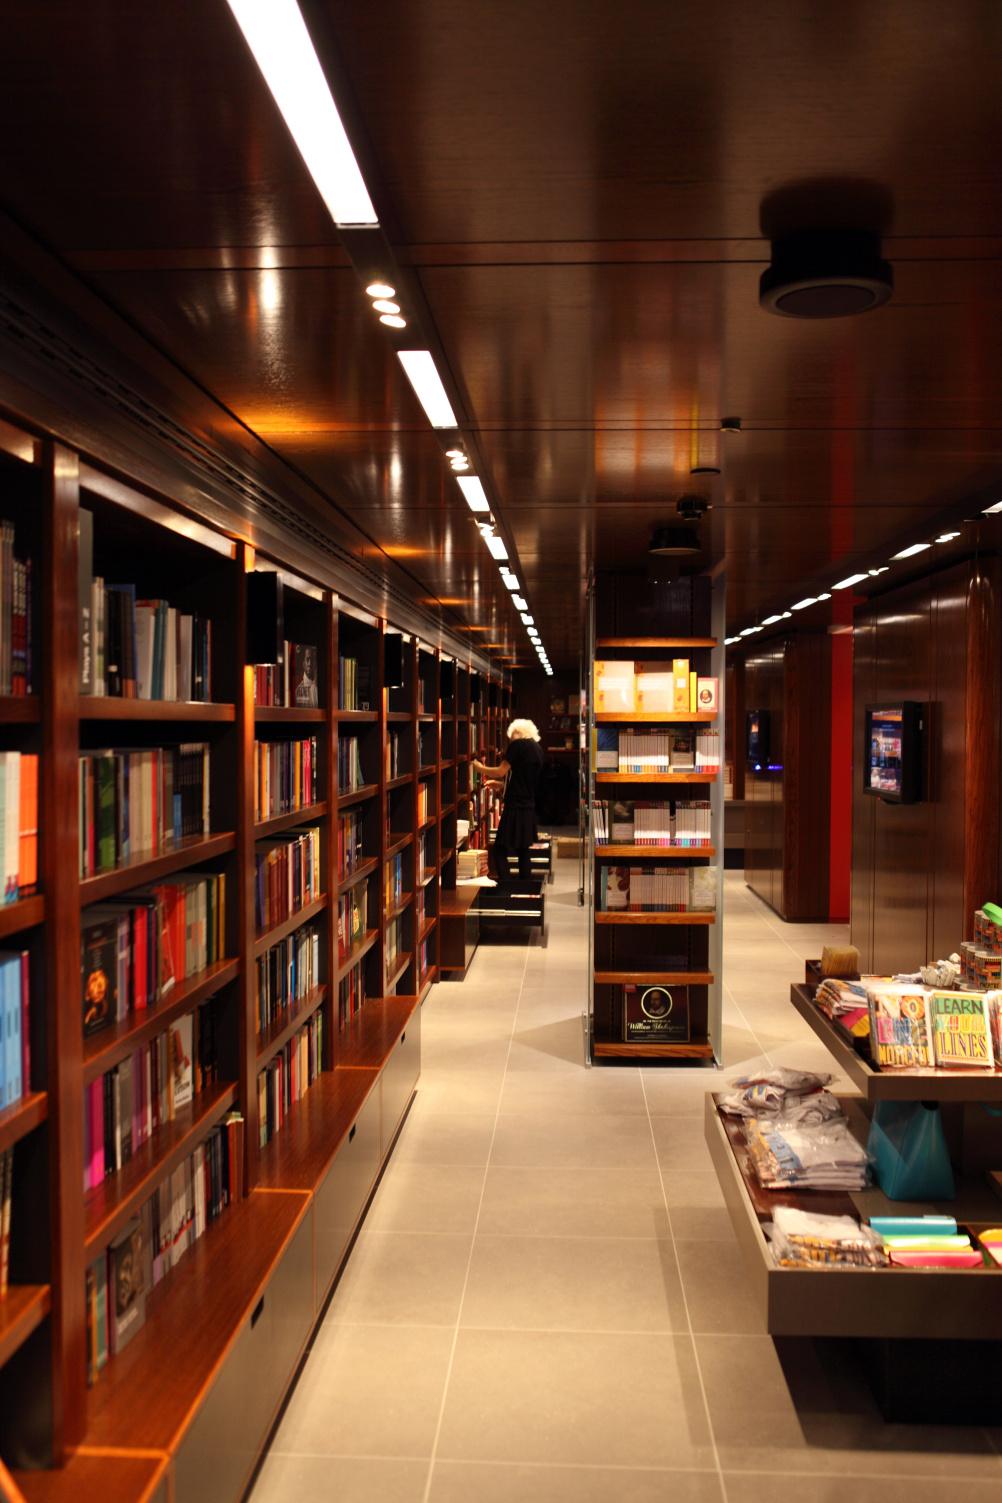 National Theatre Bookshop by Lumsden Design